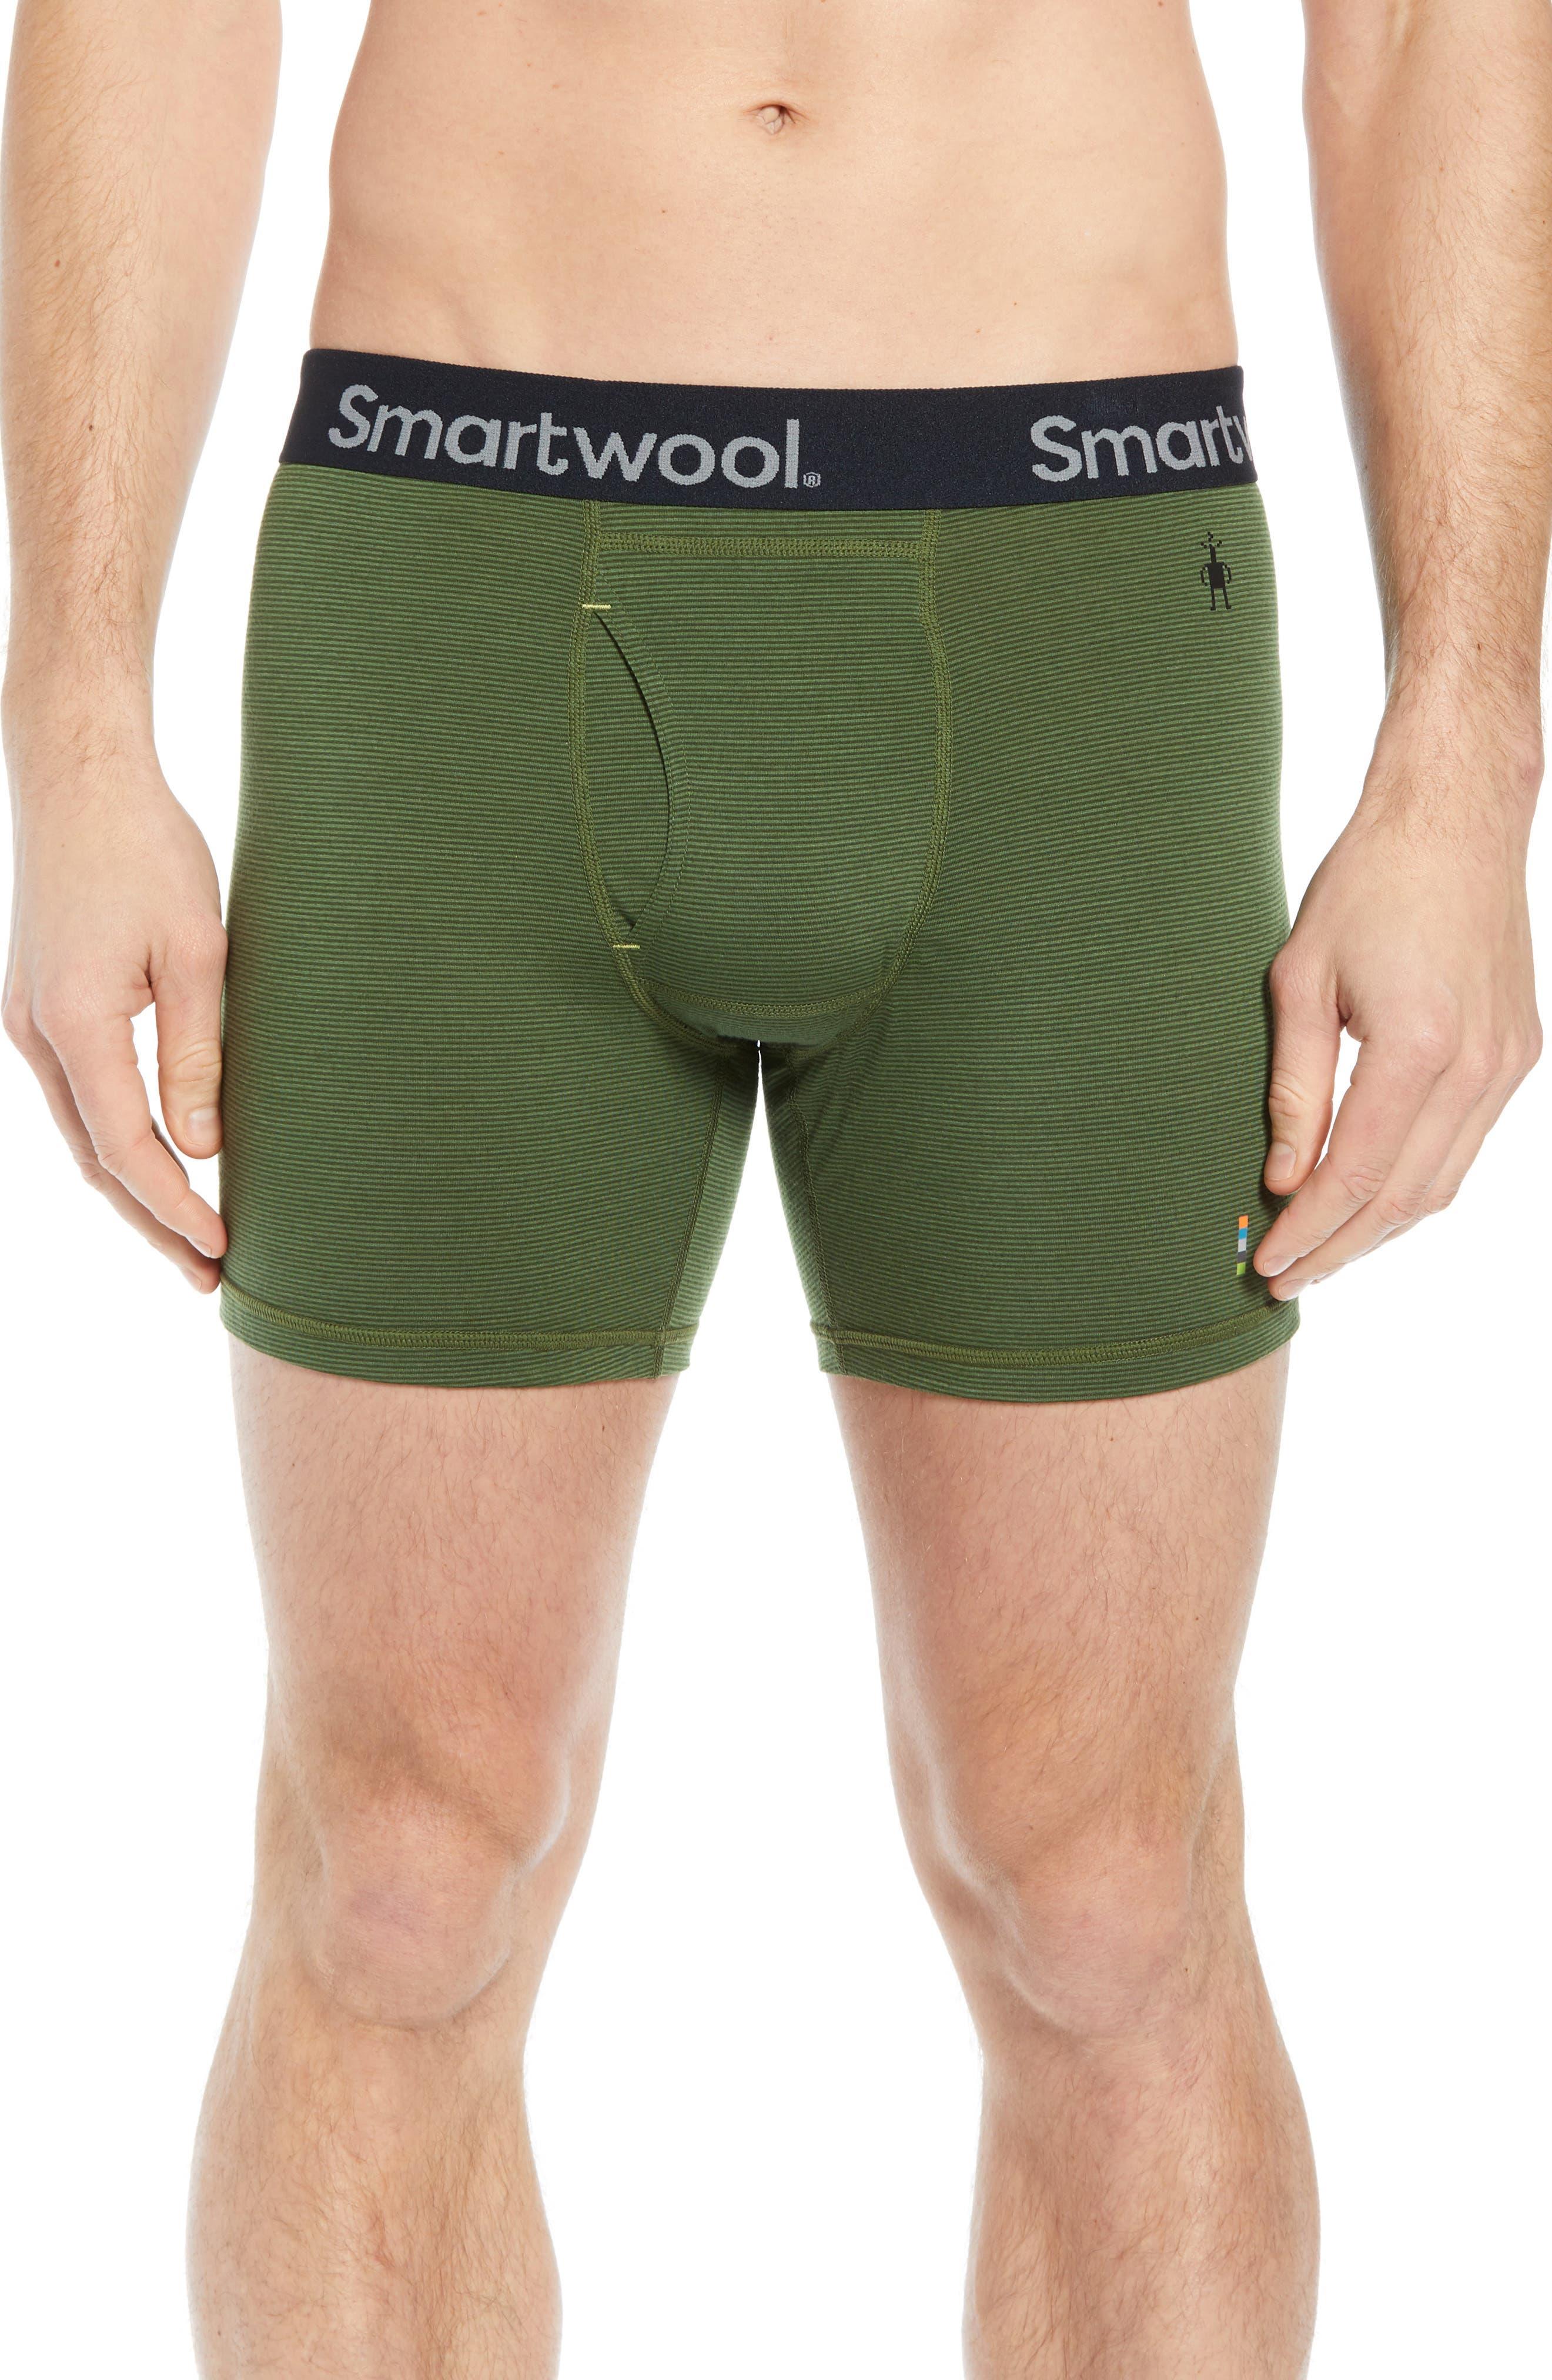 Smartwool 150 Merino Wool Blend Boxer Briefs, Green